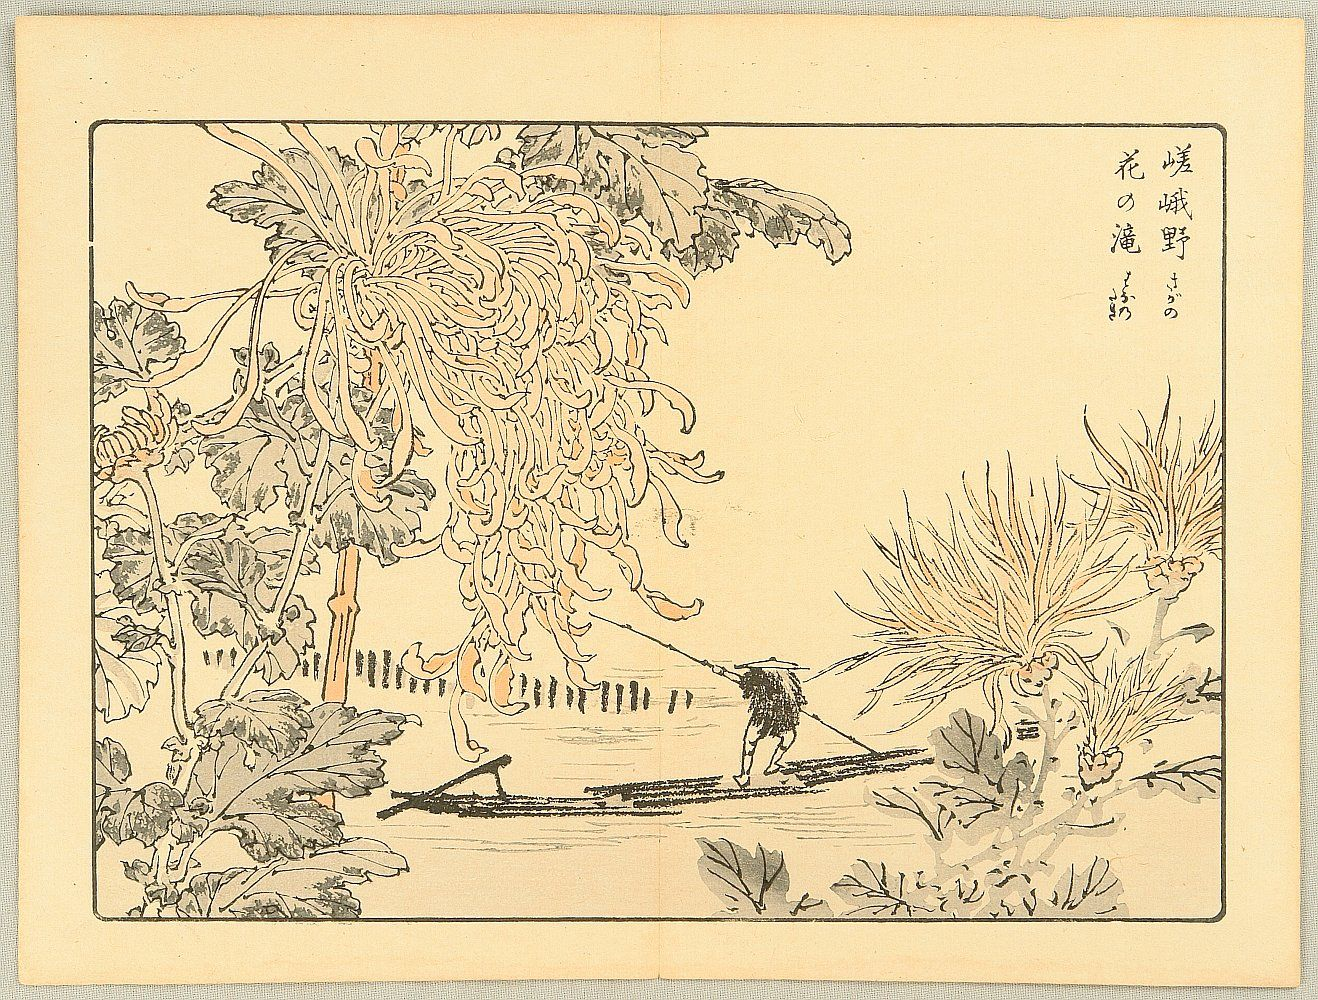 Original Kiku Hyakushu (One Hundred Chrysanthemums) Kono Bairei 1891